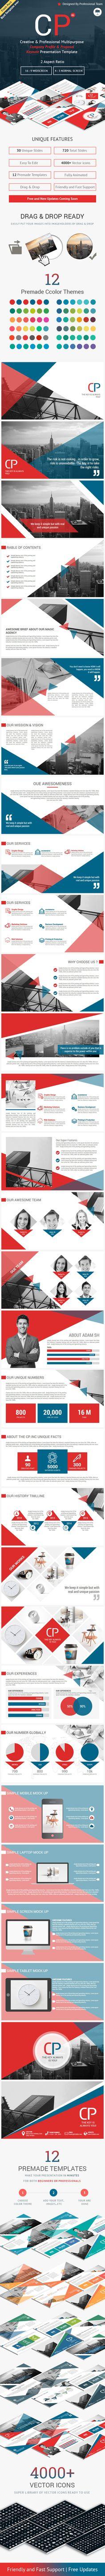 Multipurpose Company Profile and Proposal Keynote Presentation